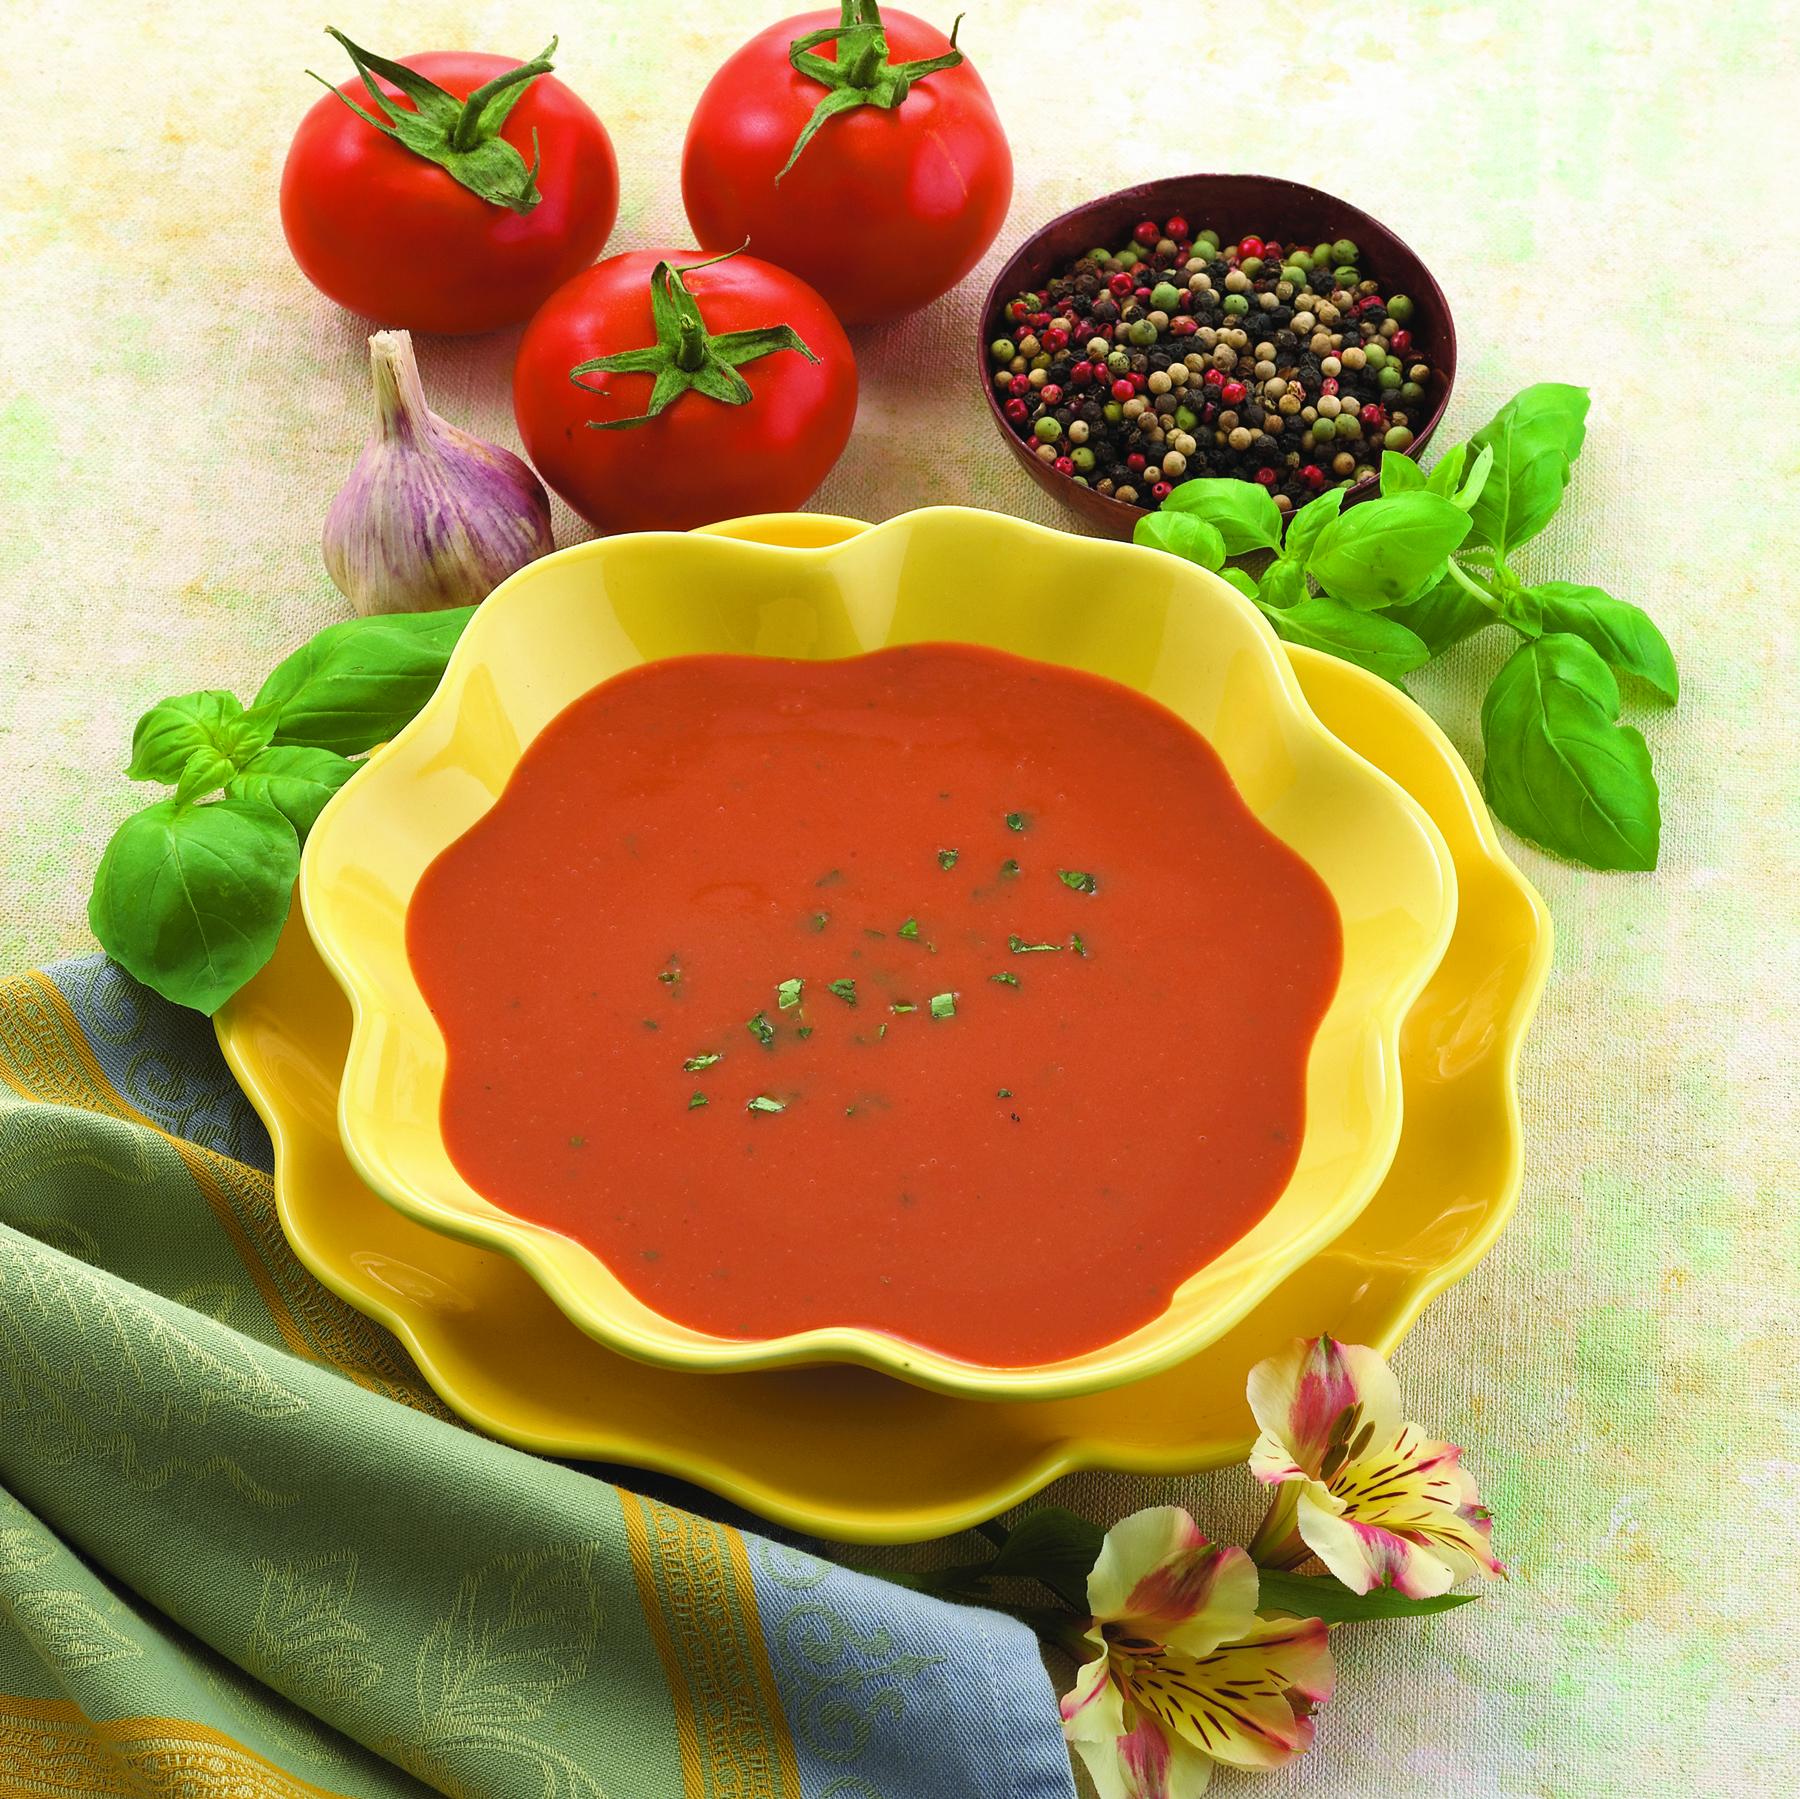 NutiMed Creamy Tomato Soup